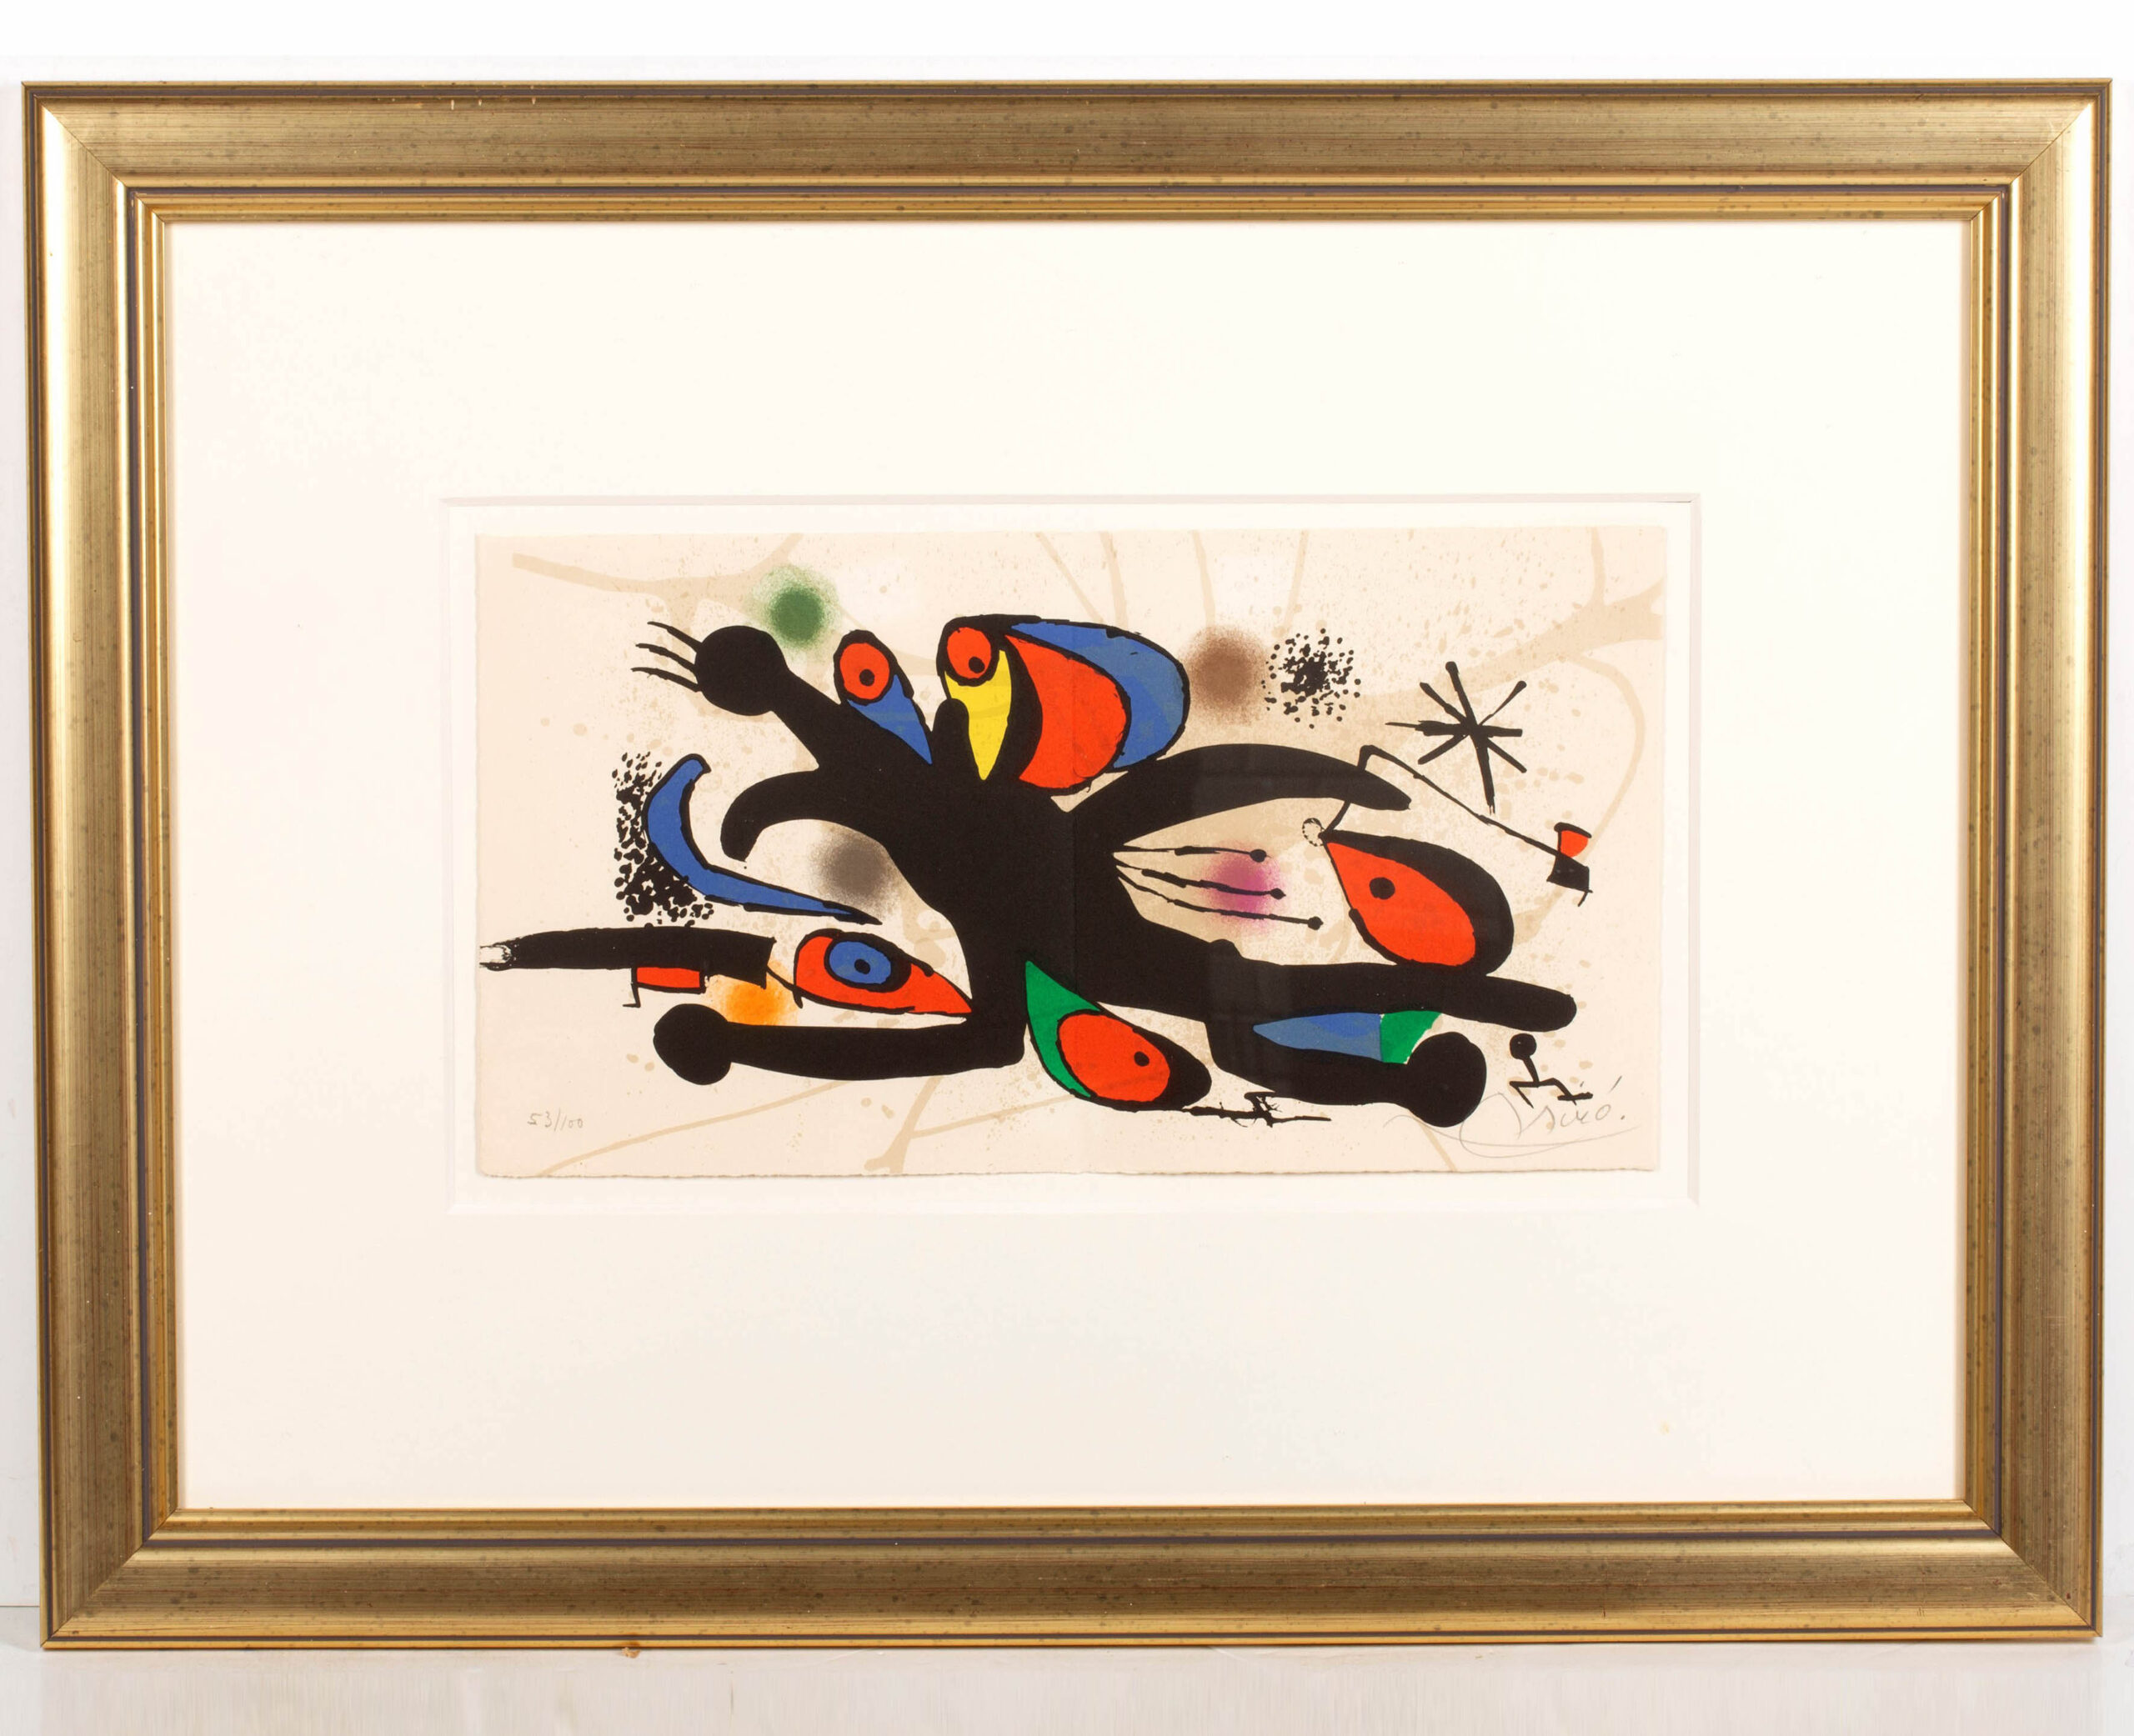 Joan Miro 'Grand Palais' lithograph